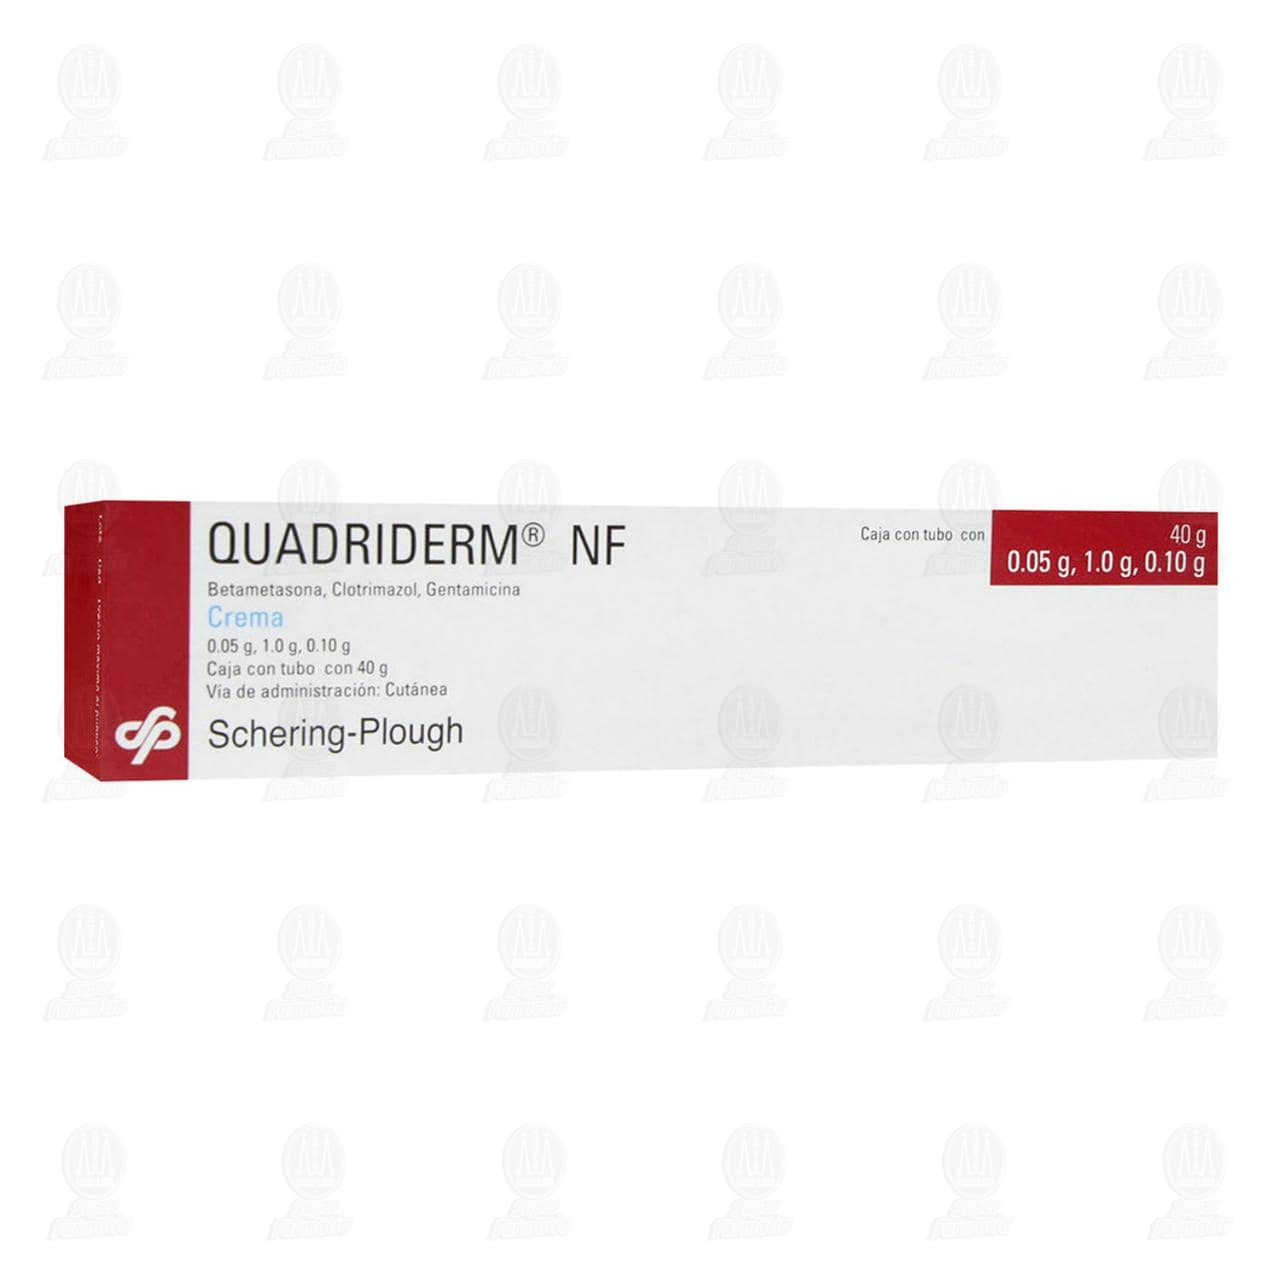 Comprar Quadriderm NF Crema 40gr en Farmacias Guadalajara